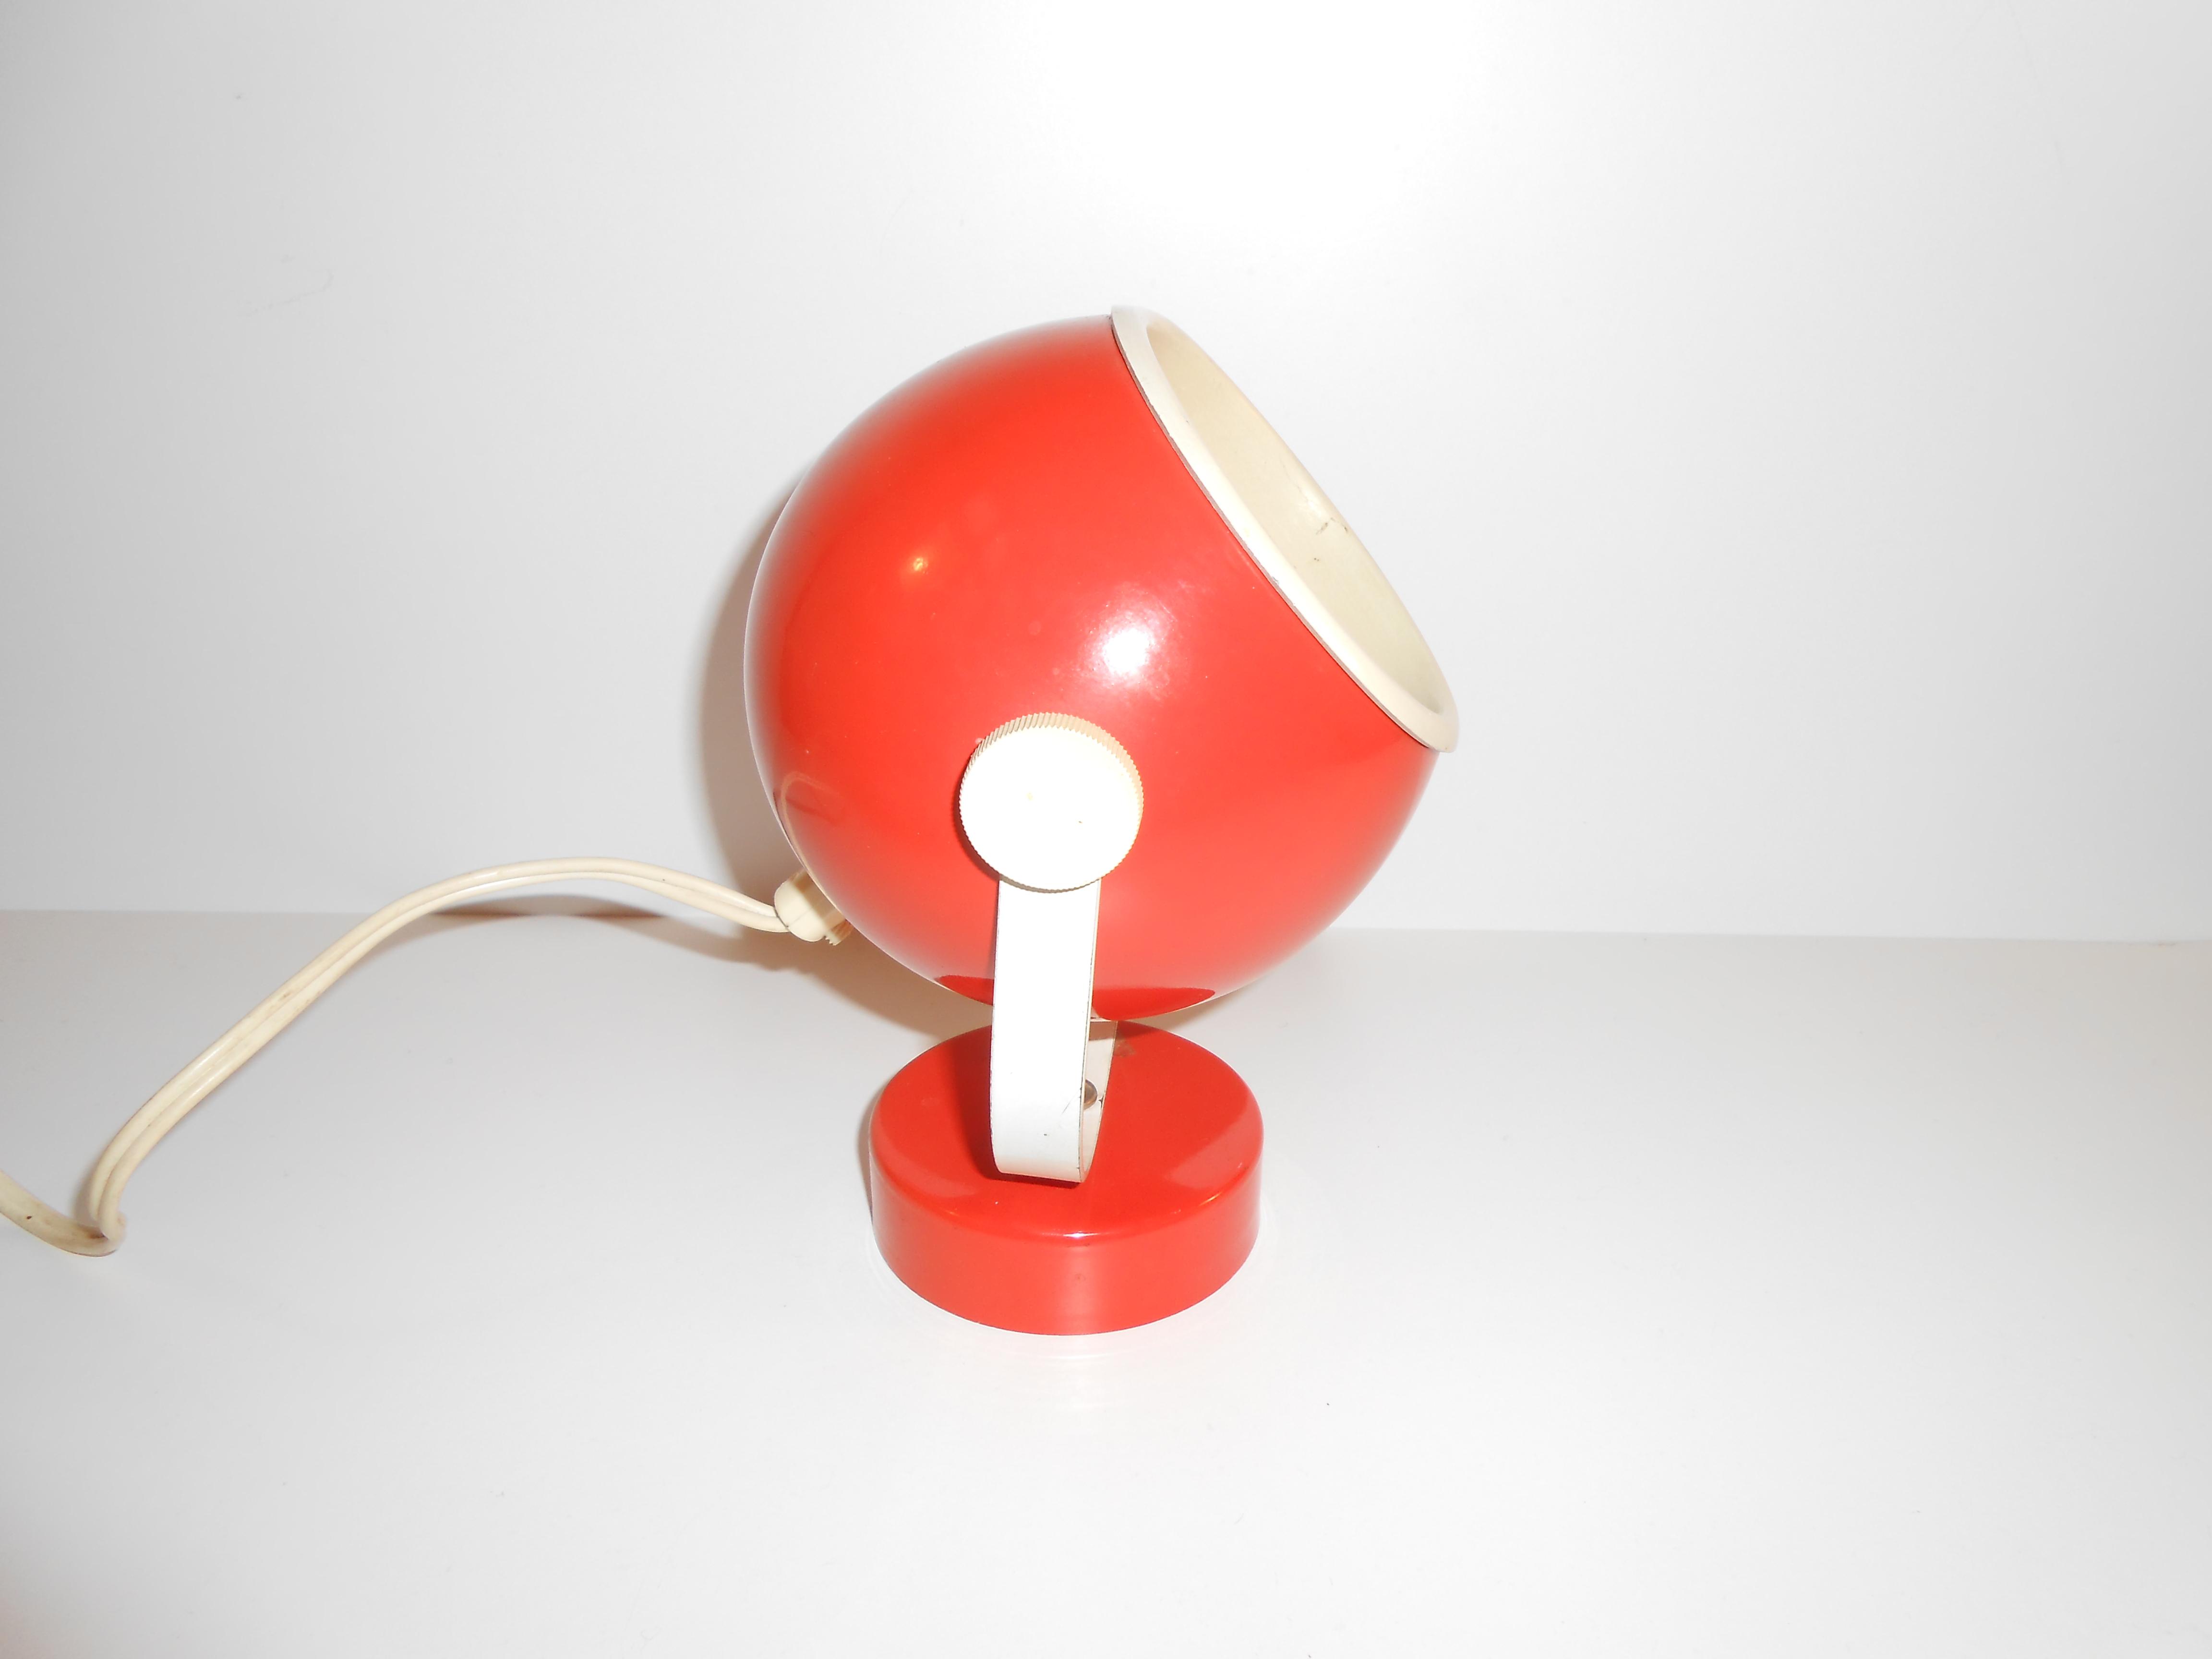 Orange kuglelampe u2013 v u00e6glampe svensk retro 1970 u2019erne u2013 retro design dk